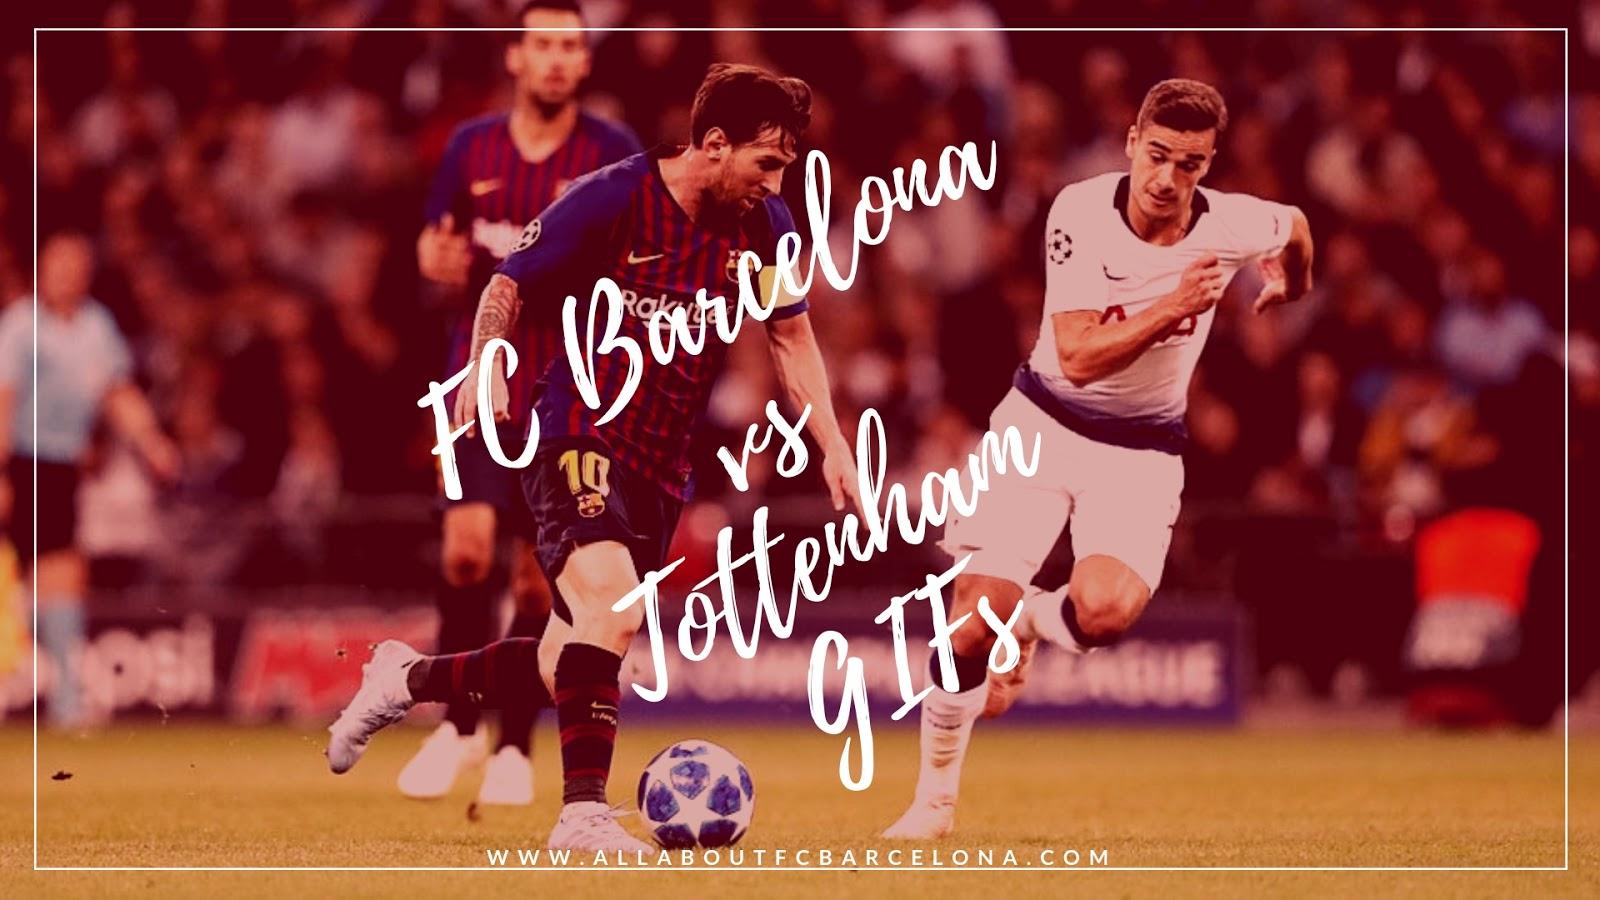 Barca vs Tottenham Mathc GIFs #Barca #BarcaTottenham #FCBarcelona #BarcaGifs